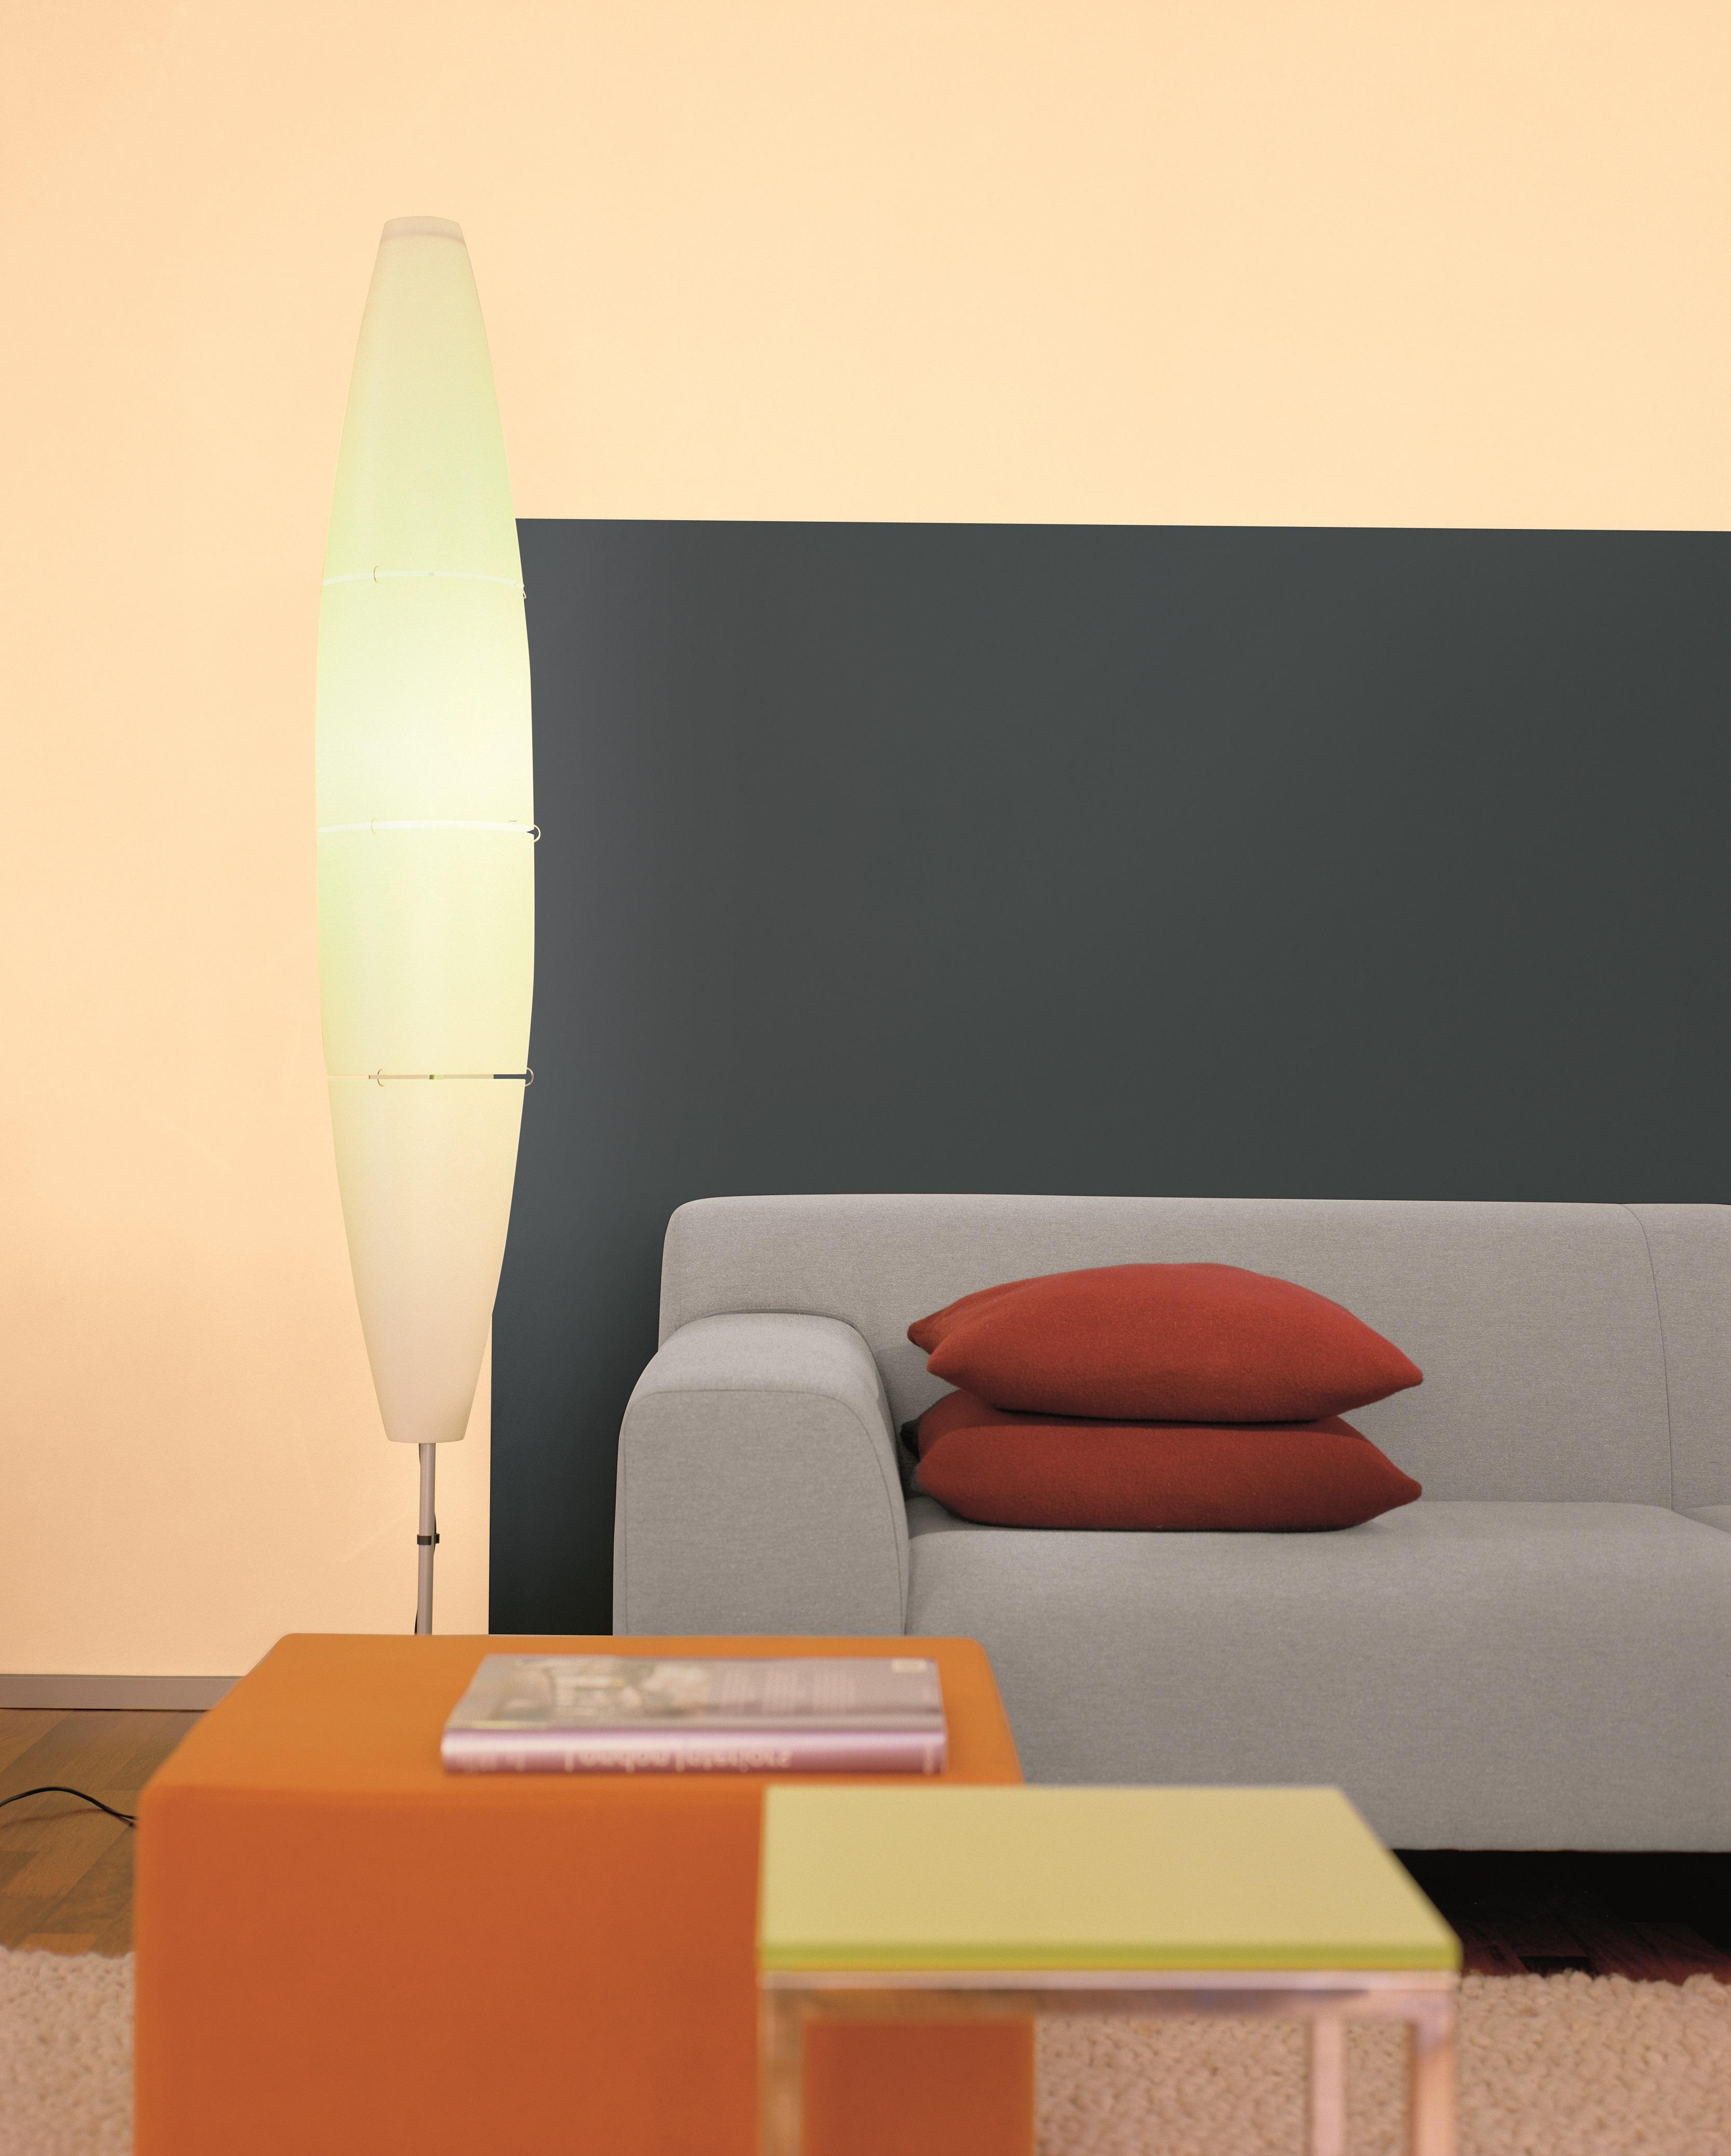 farb wirkung von grau im raum alpina farbe wirkung. Black Bedroom Furniture Sets. Home Design Ideas